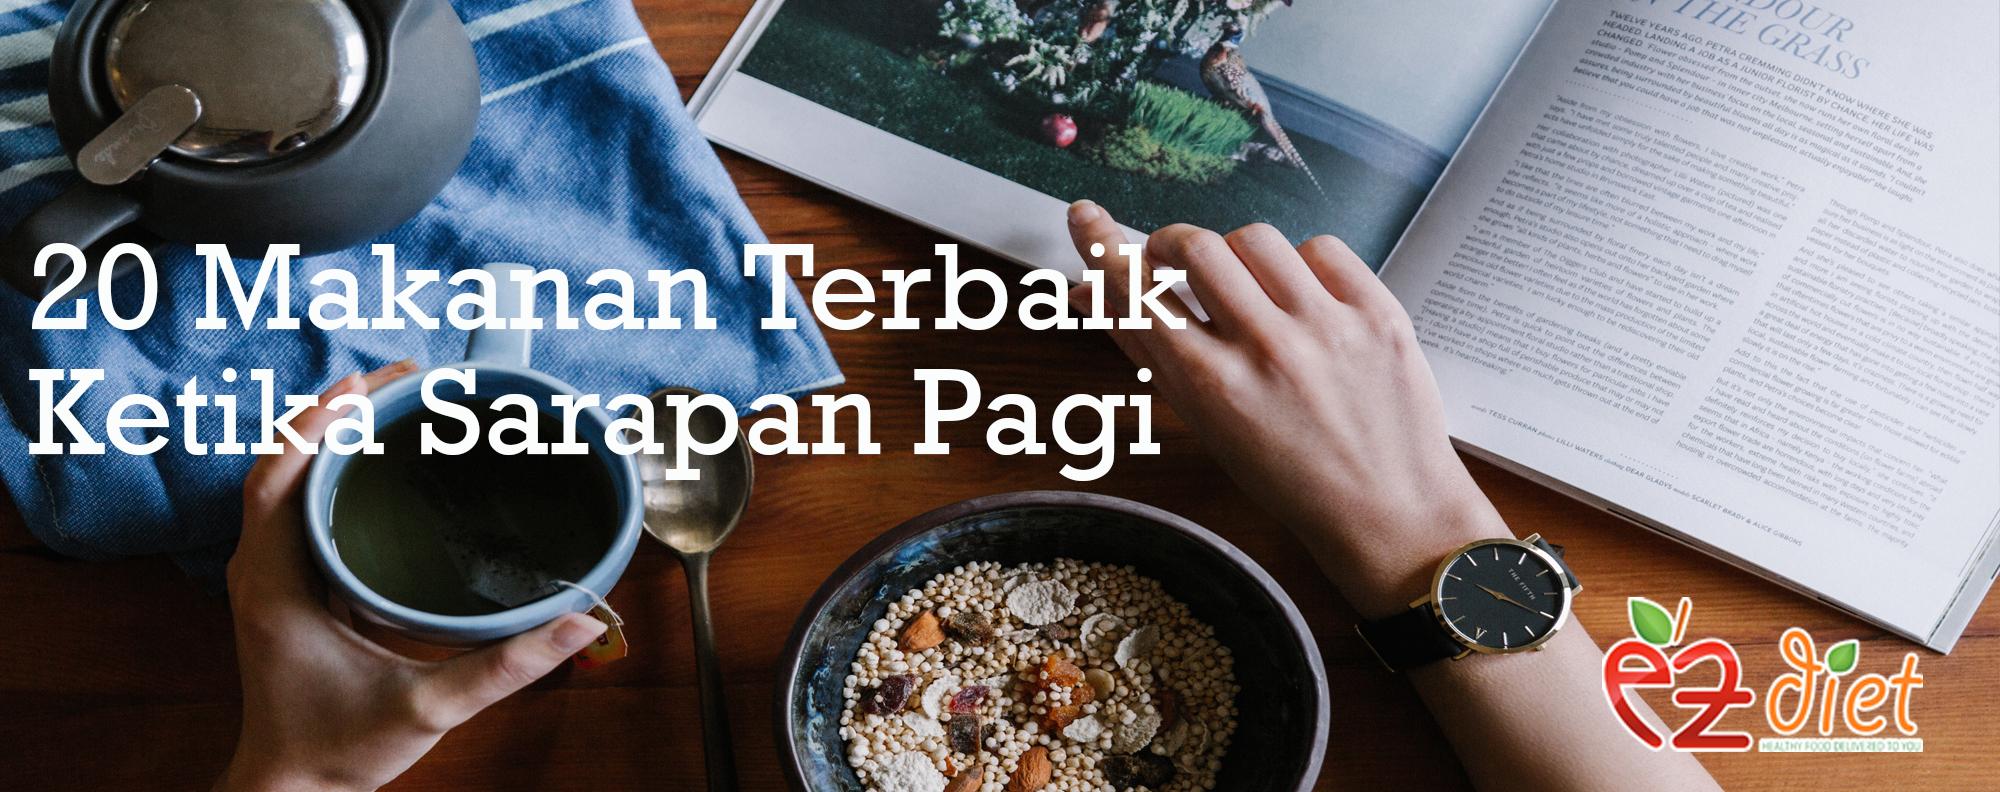 20 Makanan Terbaik Ketika Sarapan Ezdiet Sdn Bhd